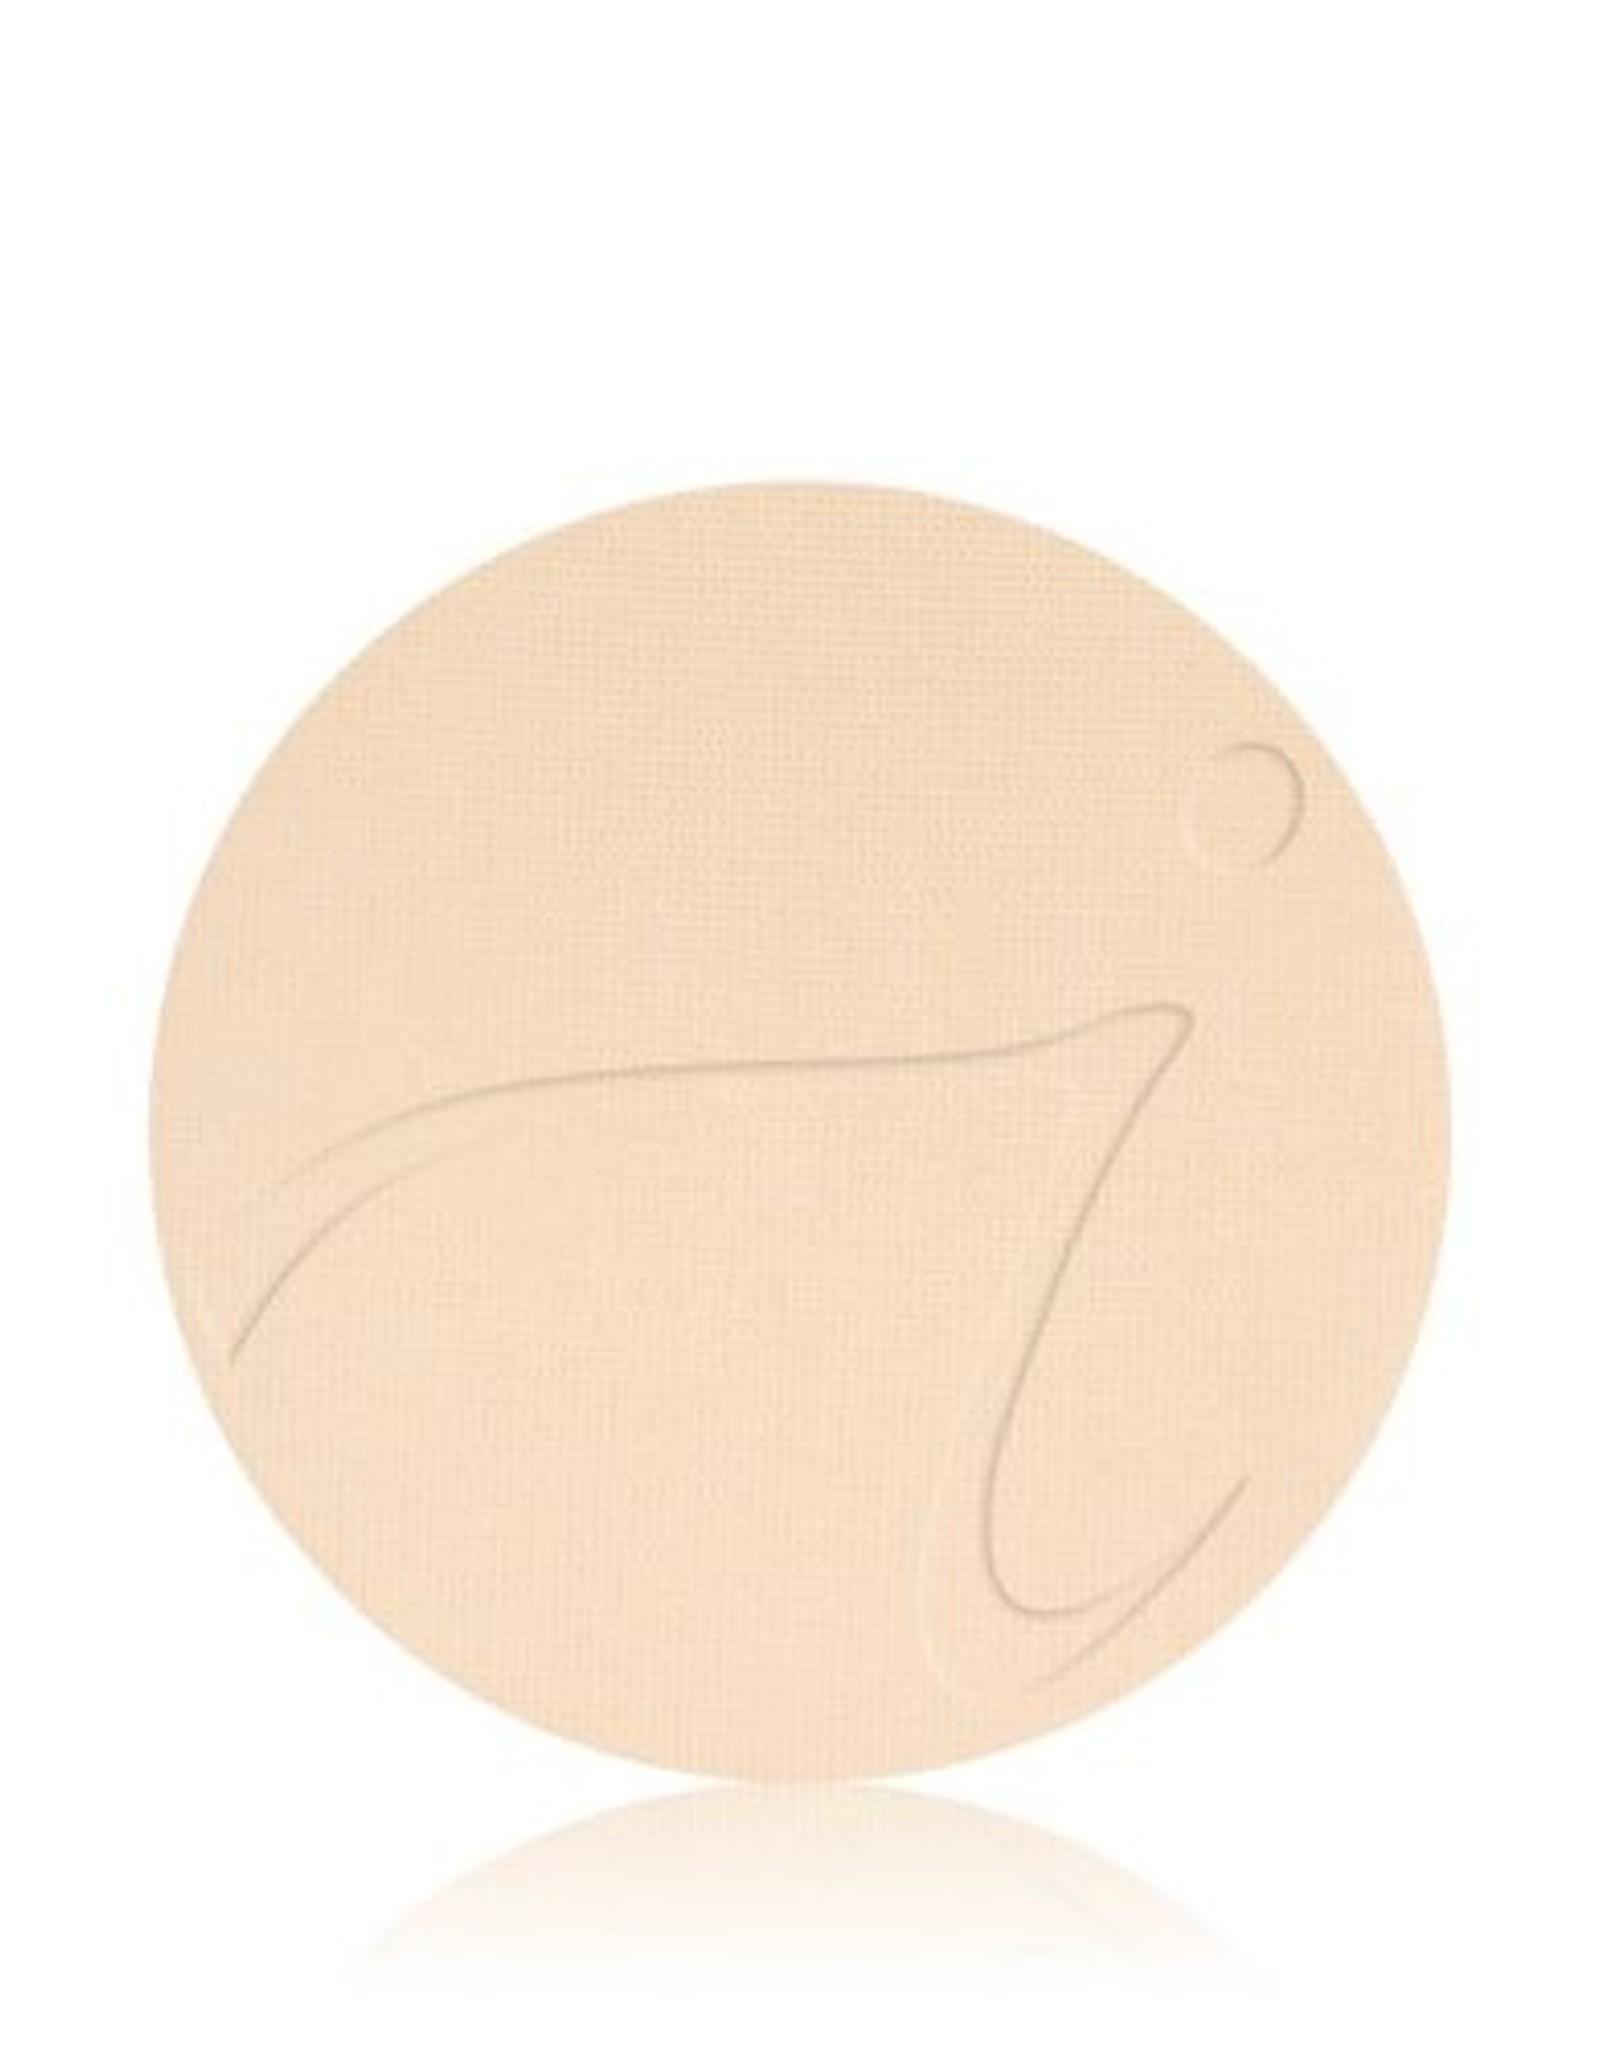 Jane Iredale Pure Pressed Base Refill | Fair - Light - Medium